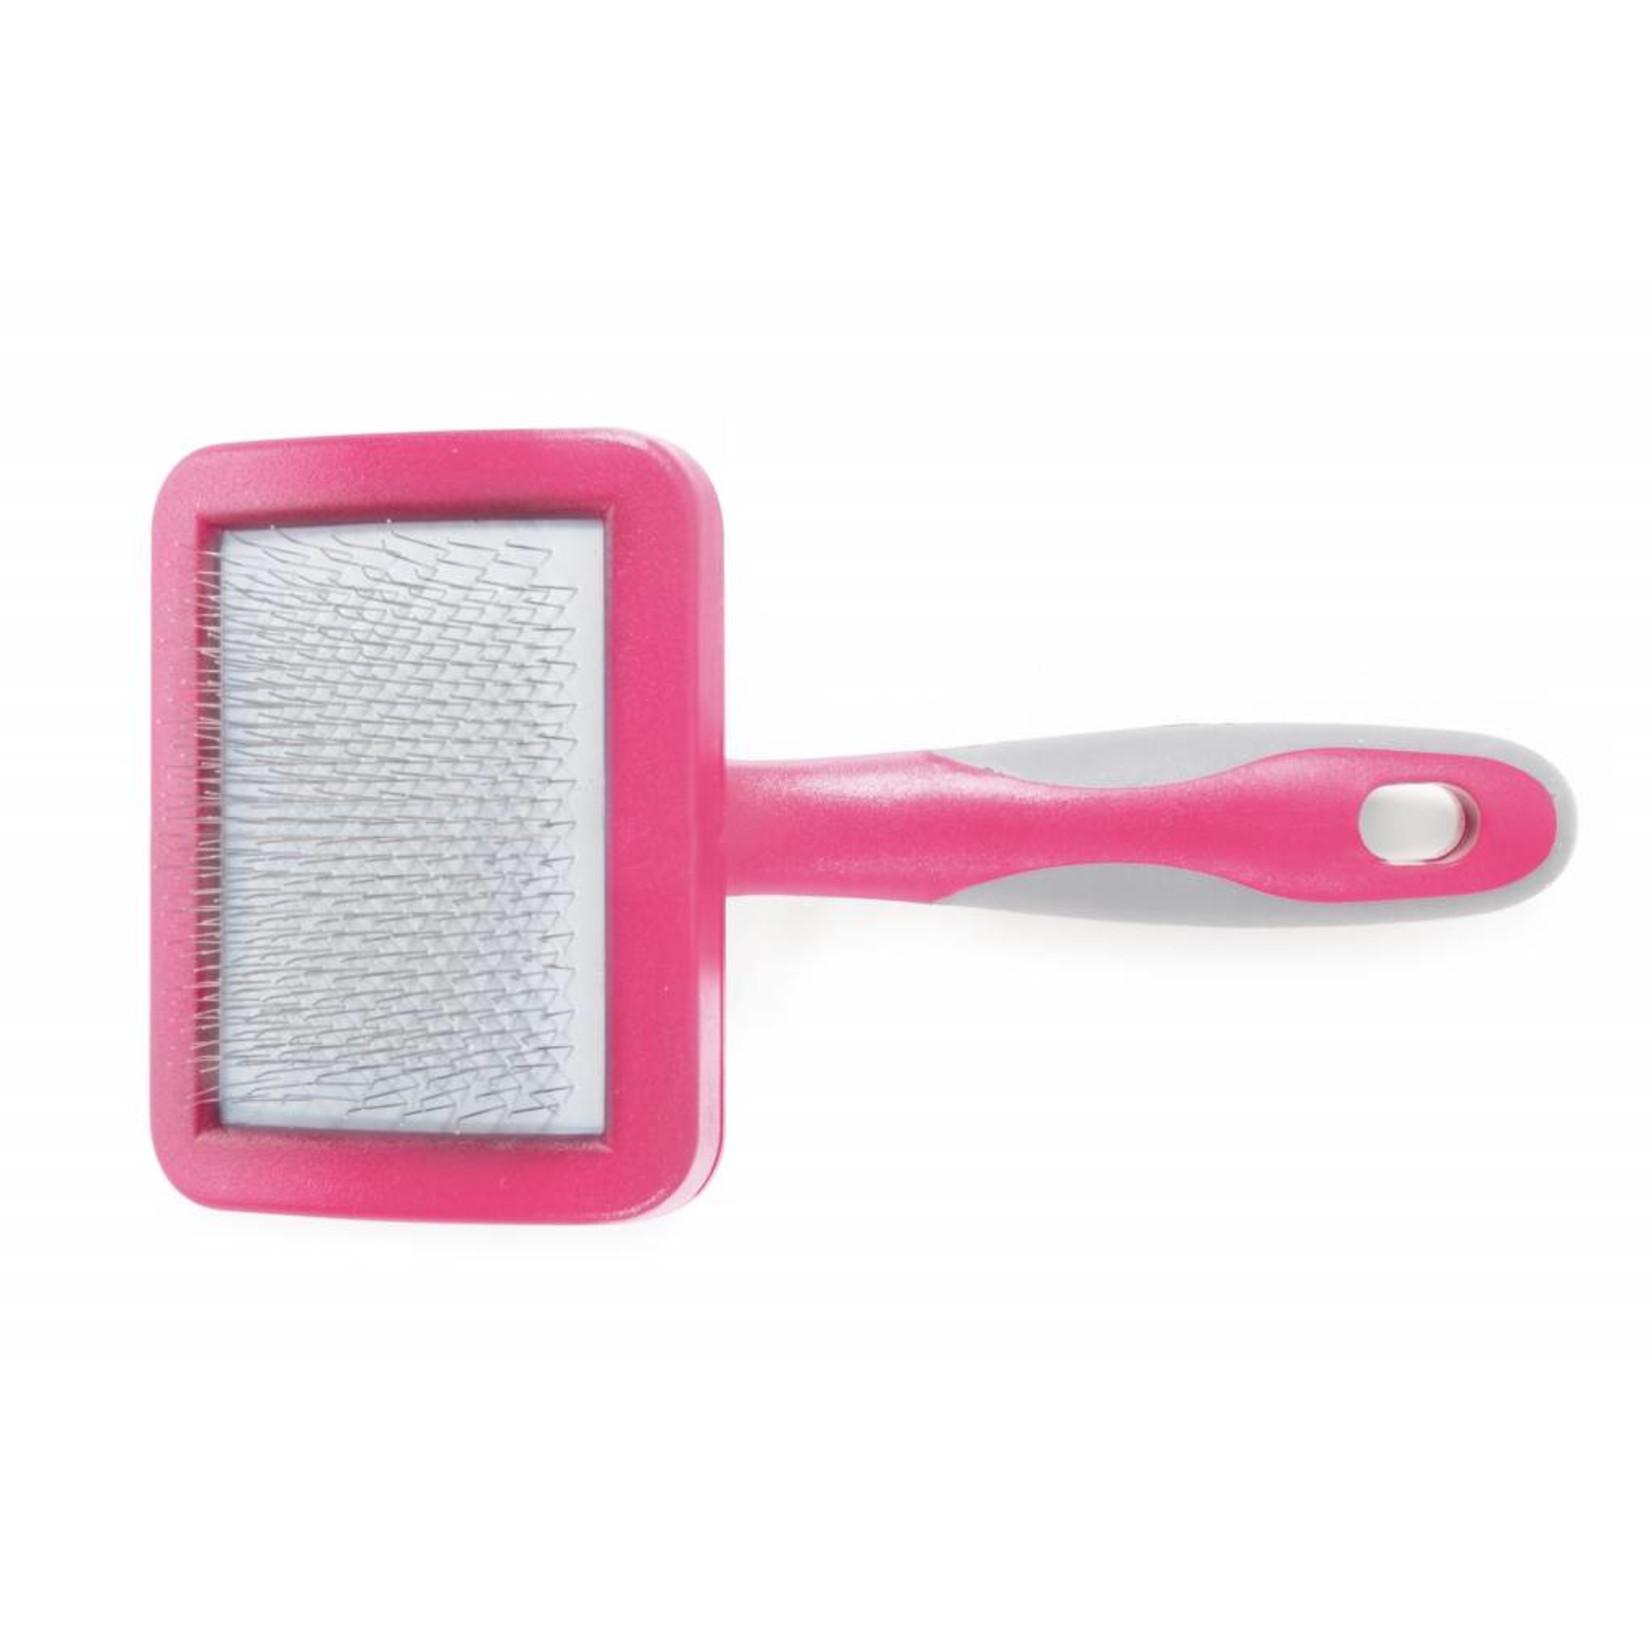 Ancol Ergo Cat Slicker Brush